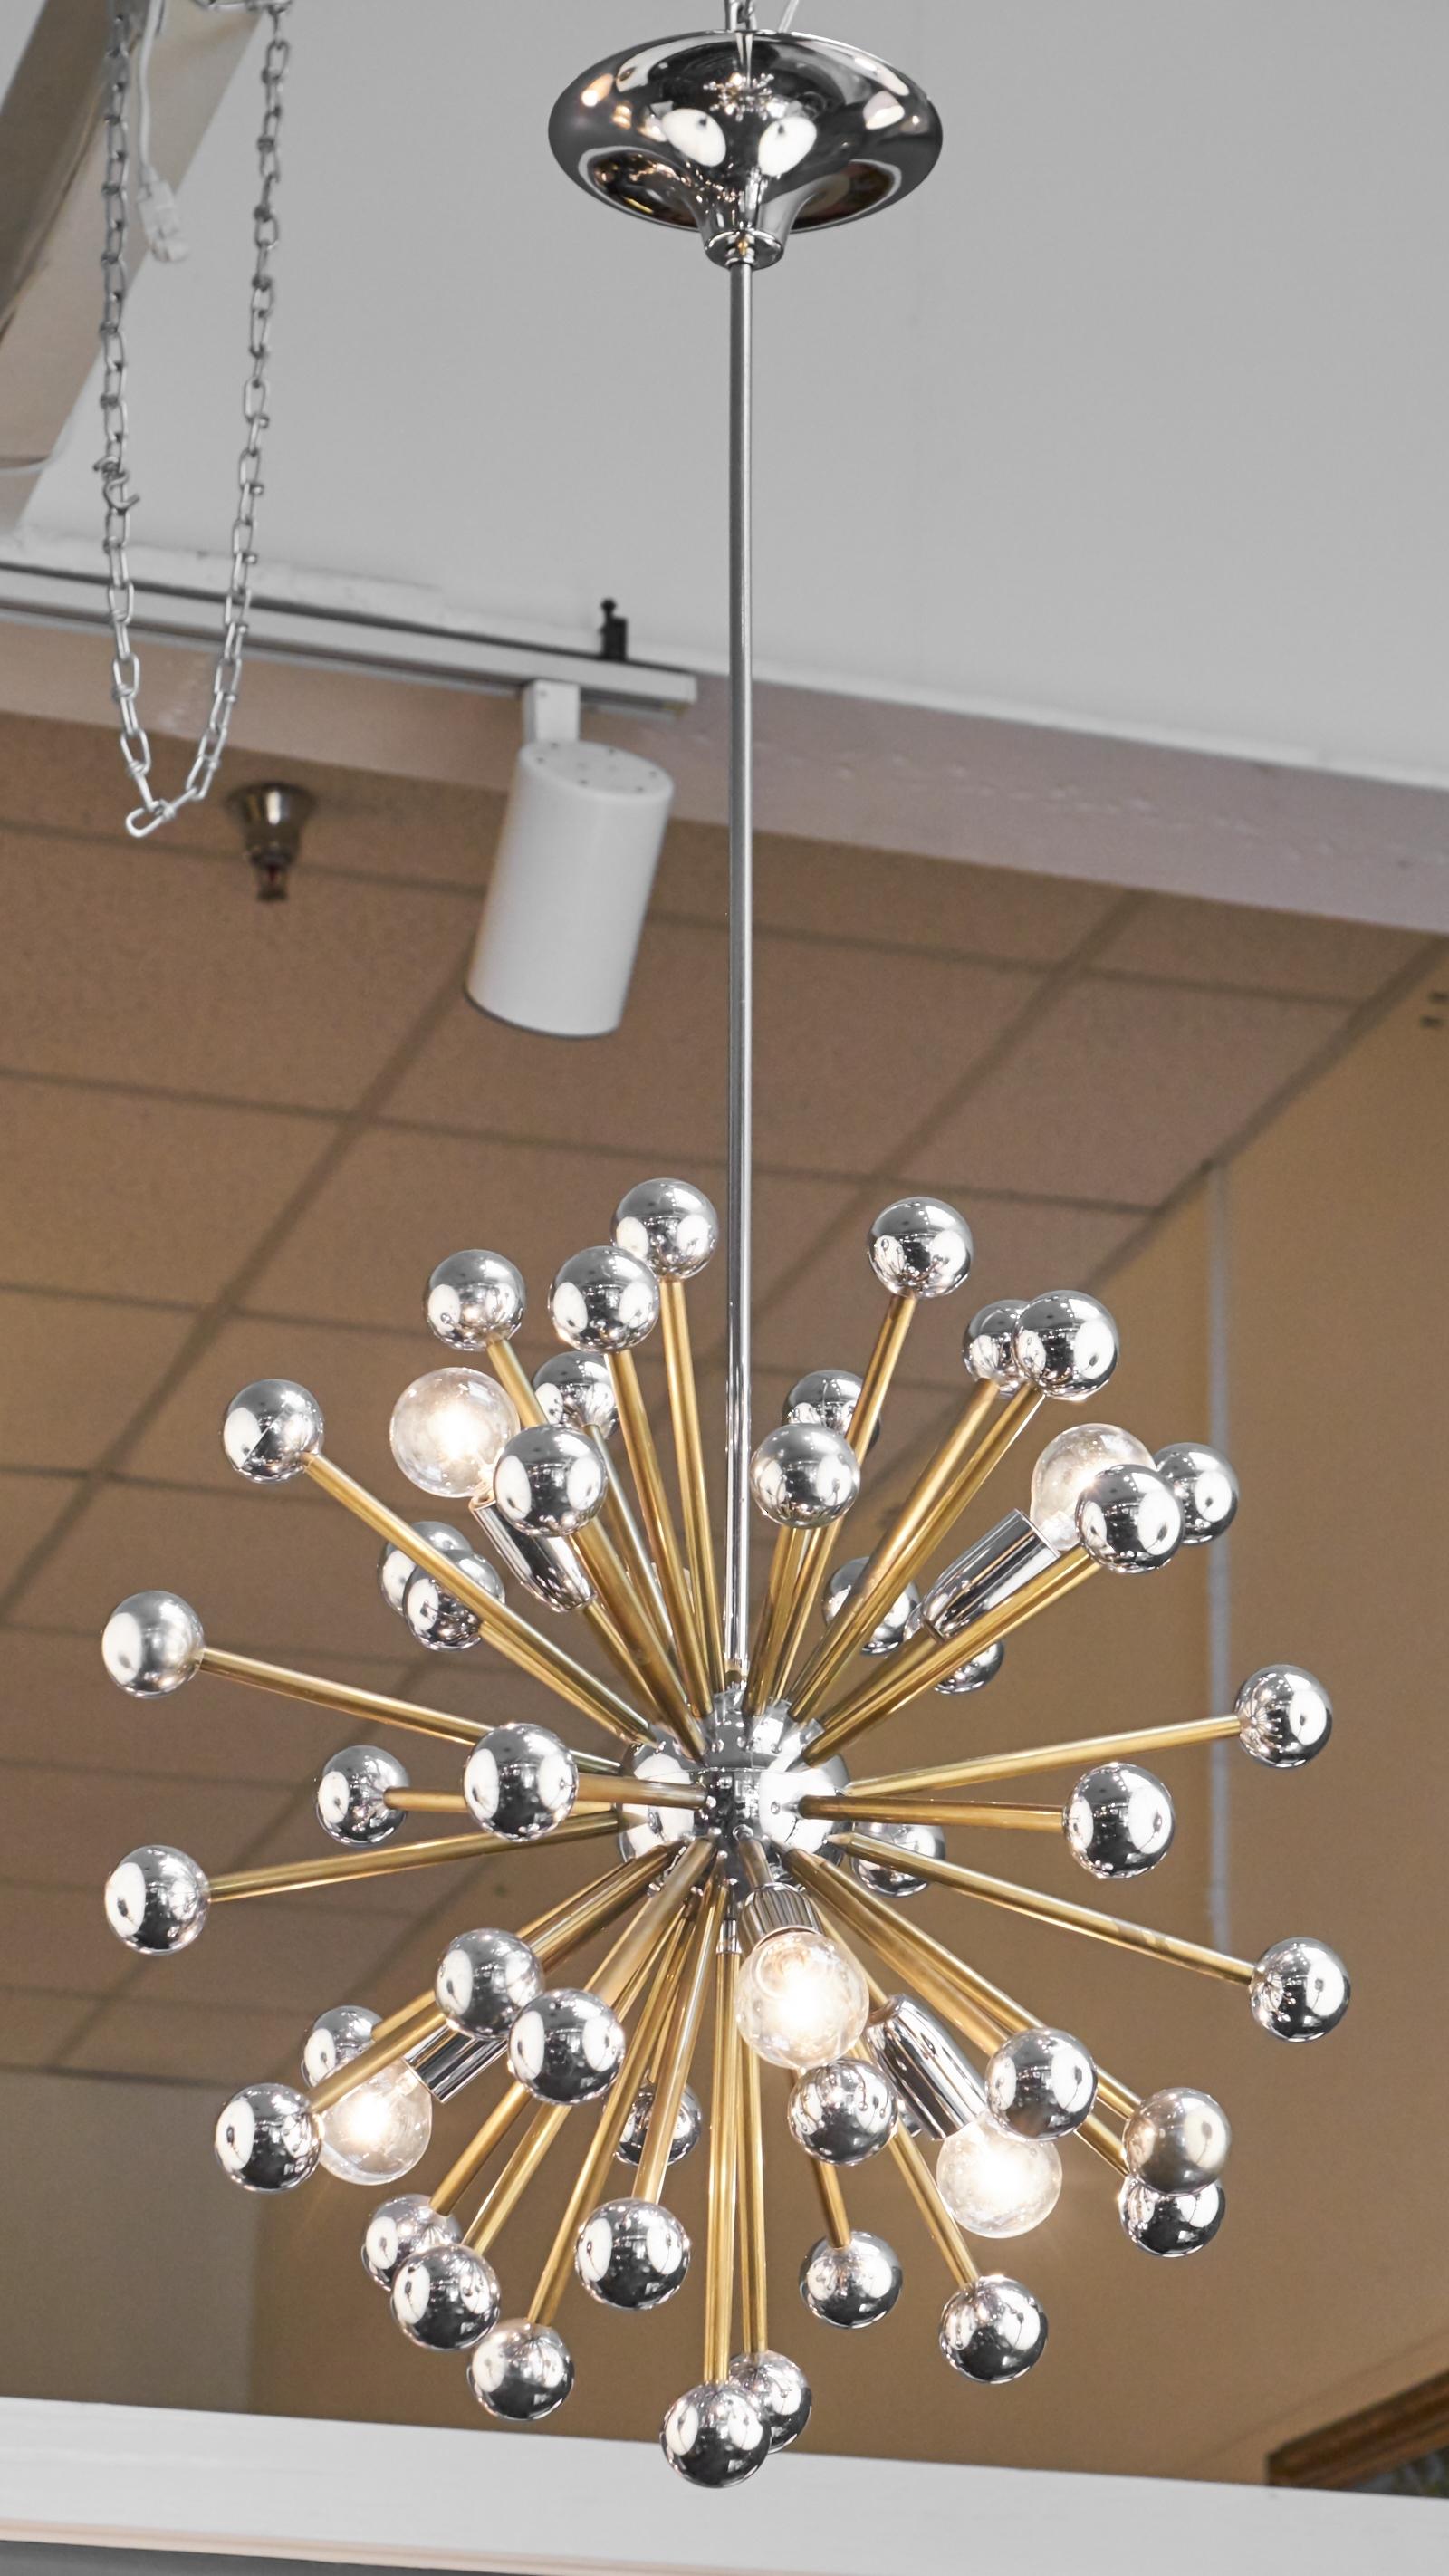 Sputnik Chandelier – Pixball Throughout Favorite Chrome Sputnik Chandeliers (View 11 of 15)